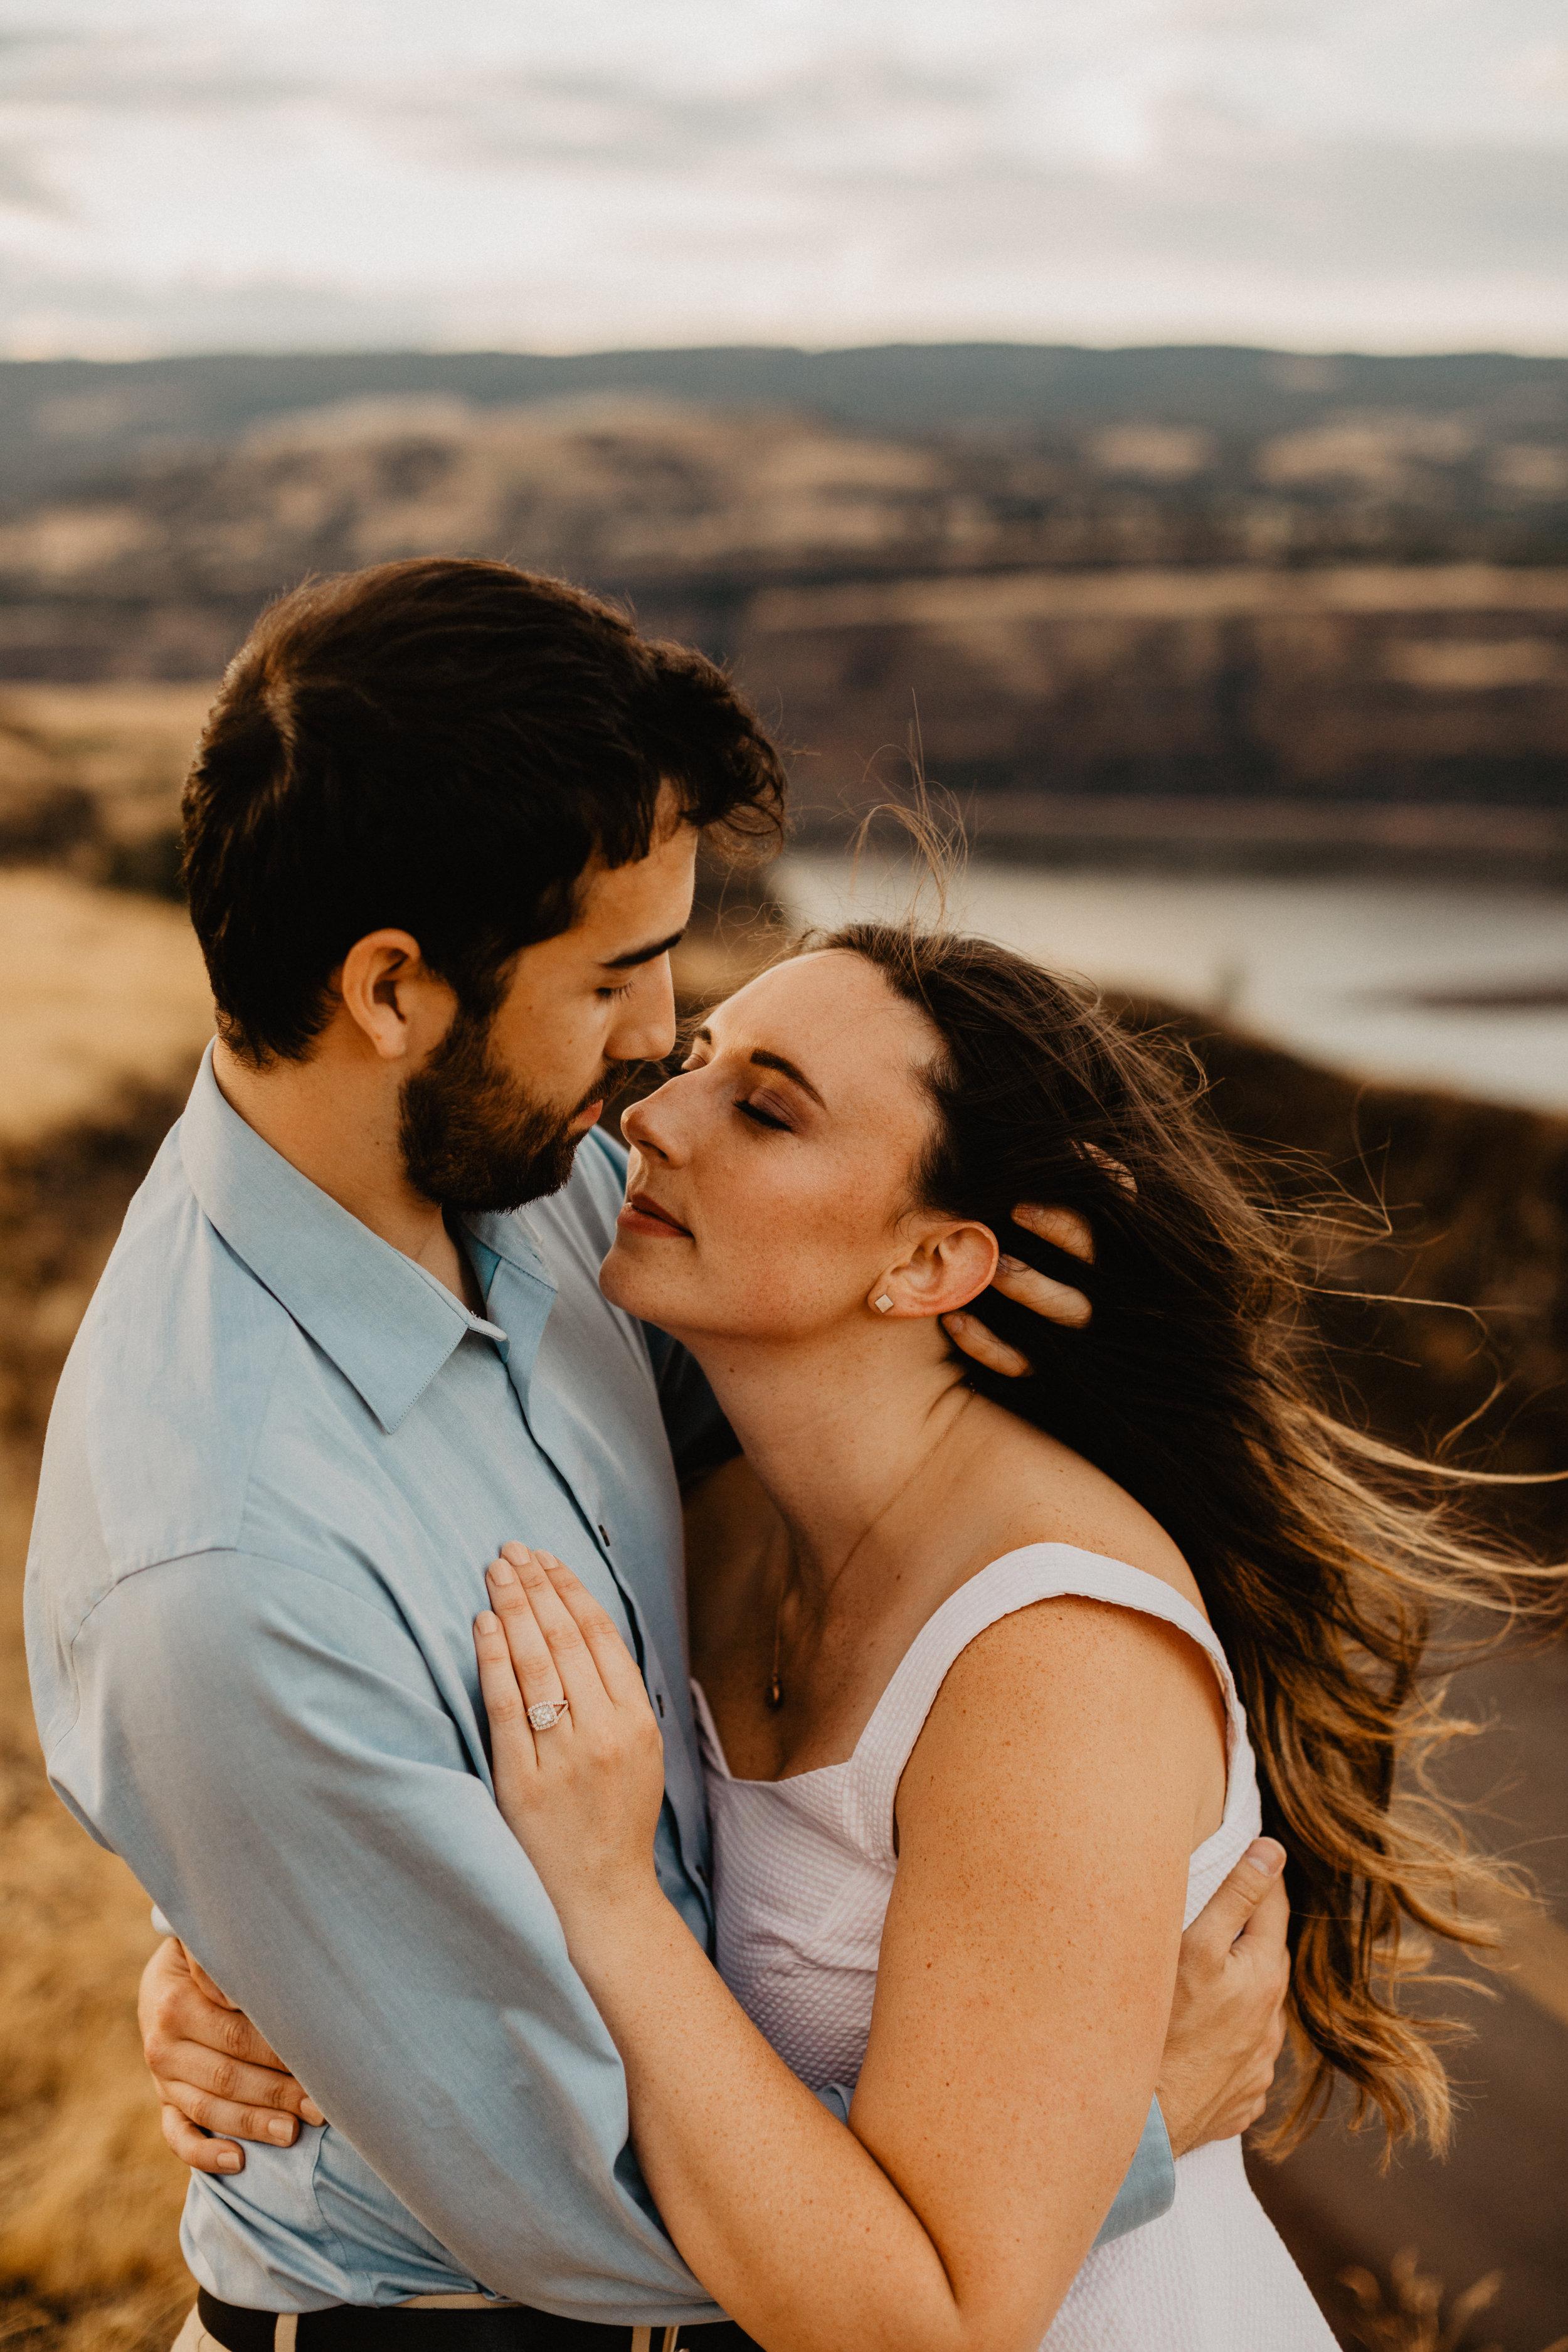 rowena crest engagement, oregon wedding photographer, engagement photos, natural light photographer-209.jpg